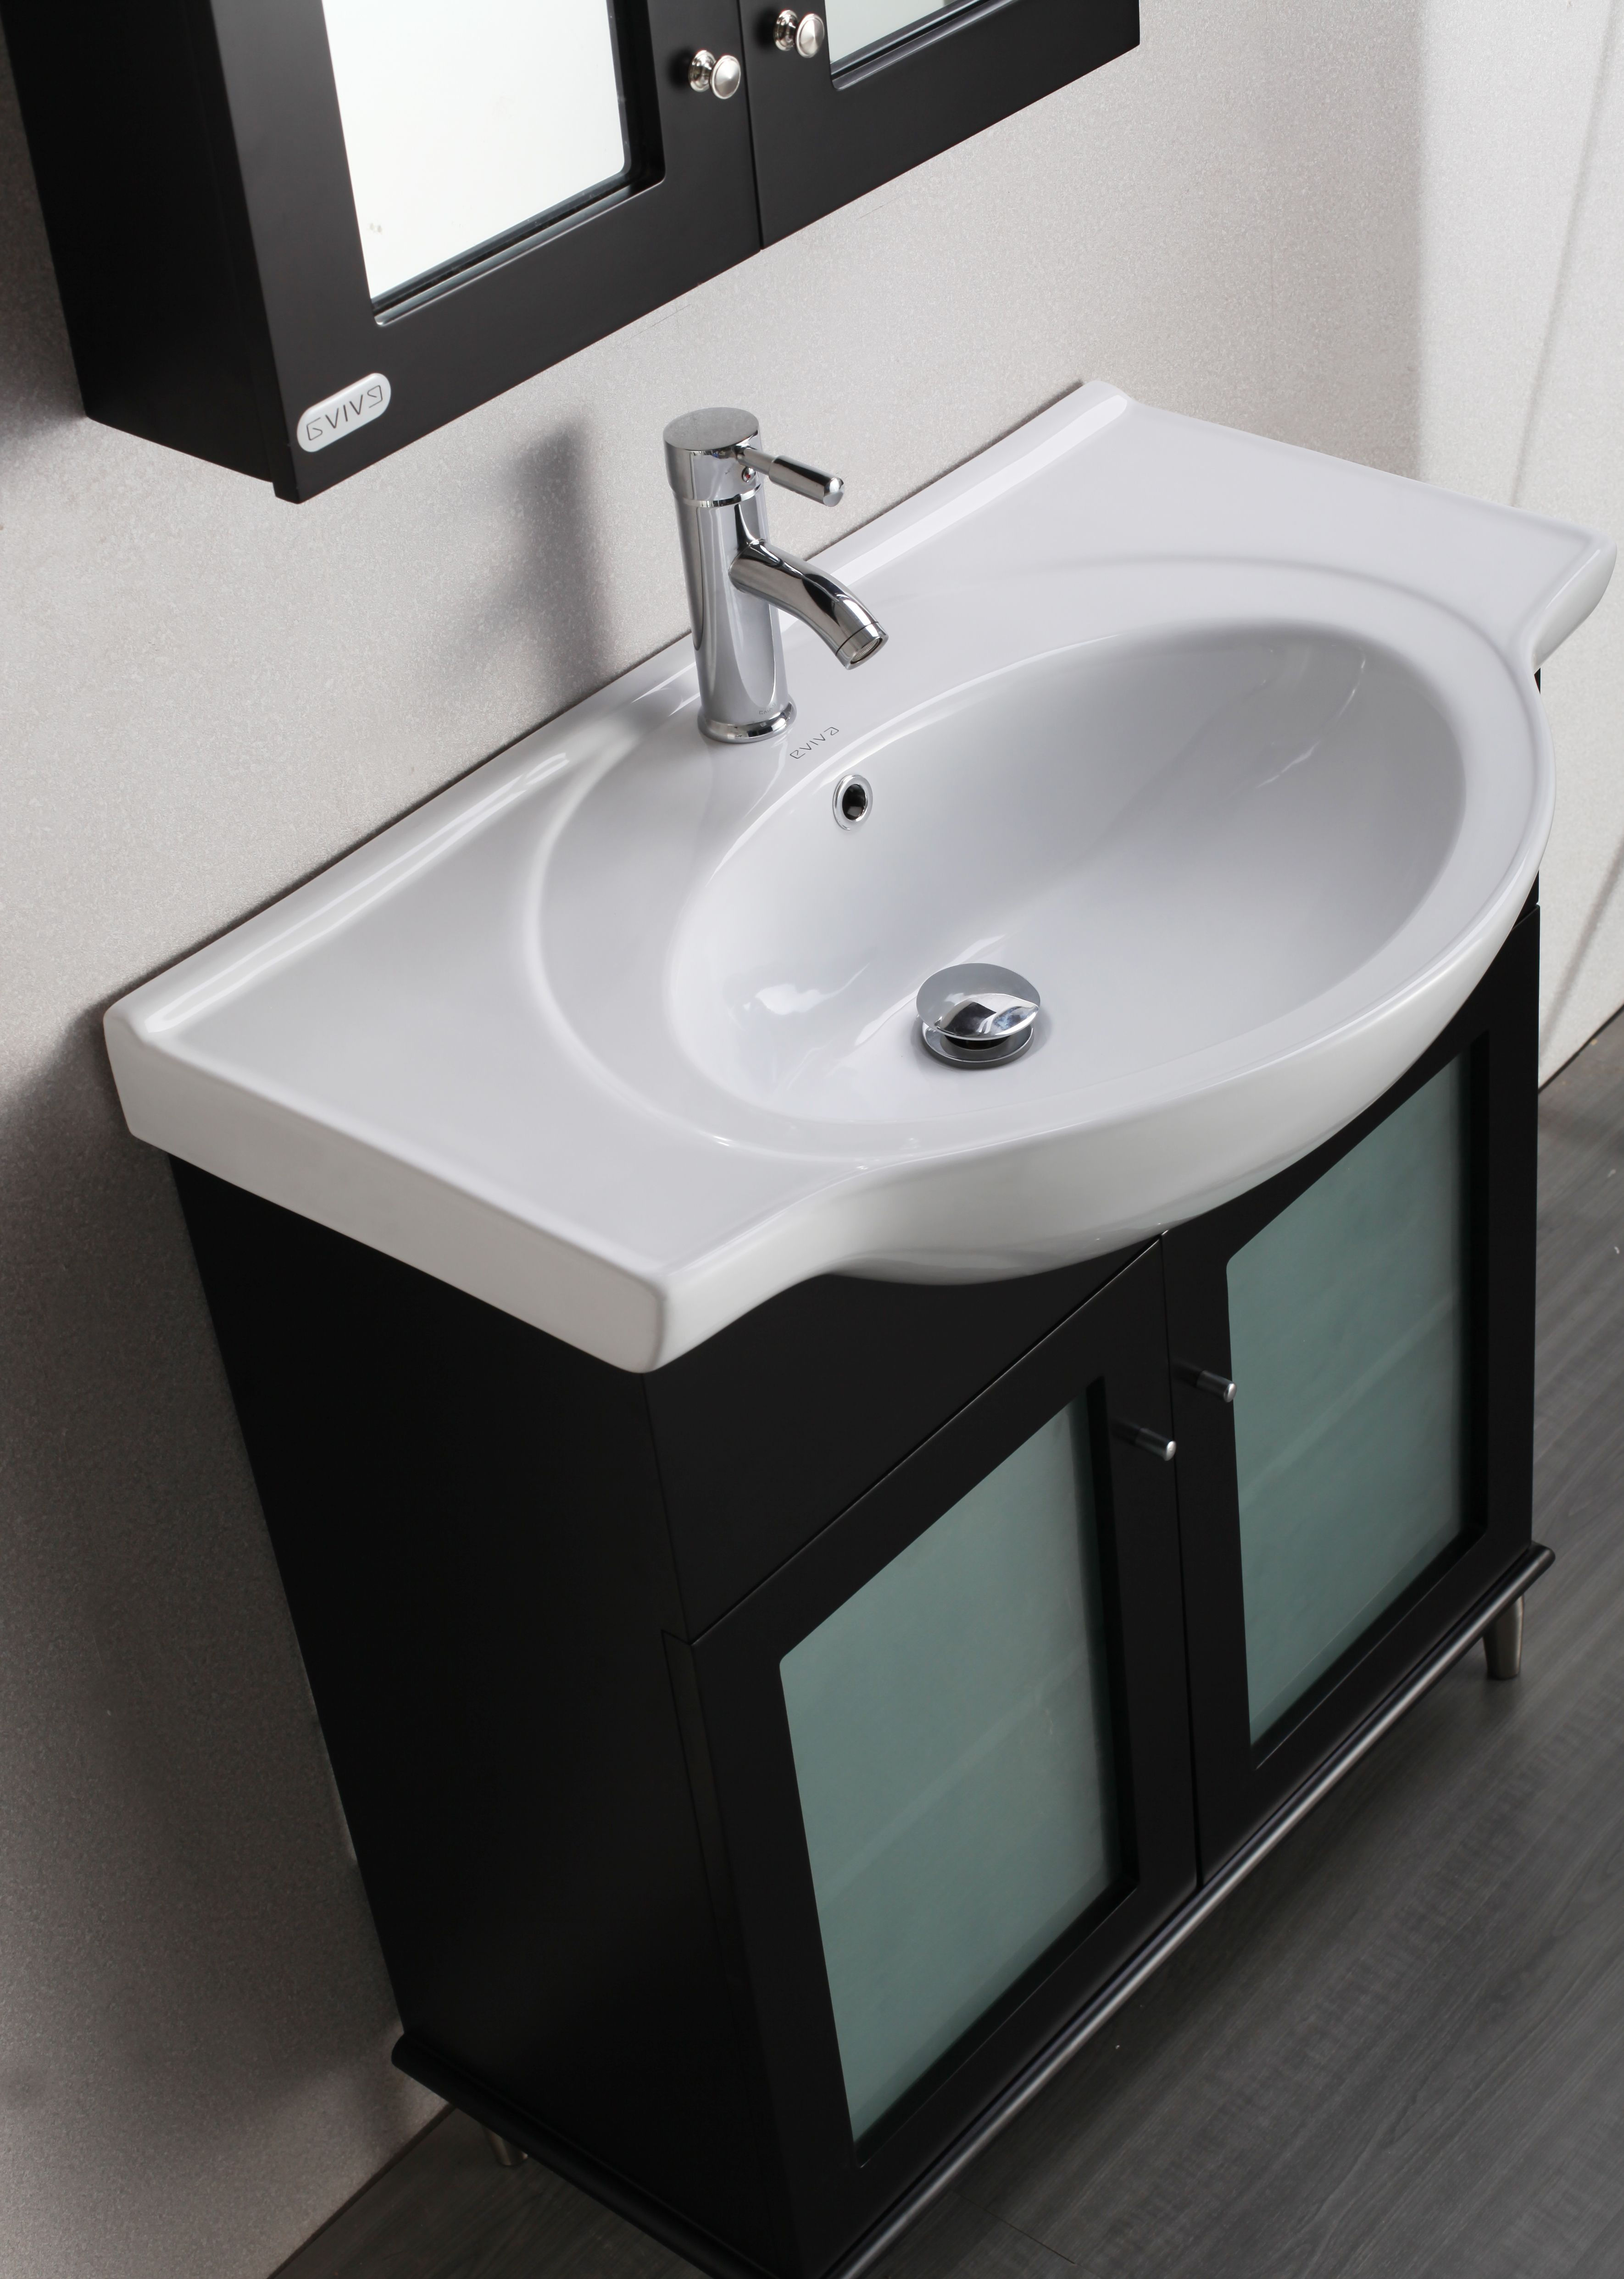 Available At Decors R Us In Paramus Nj  Bathroom Vanity Fair Bathroom Vanities Nj Inspiration Design